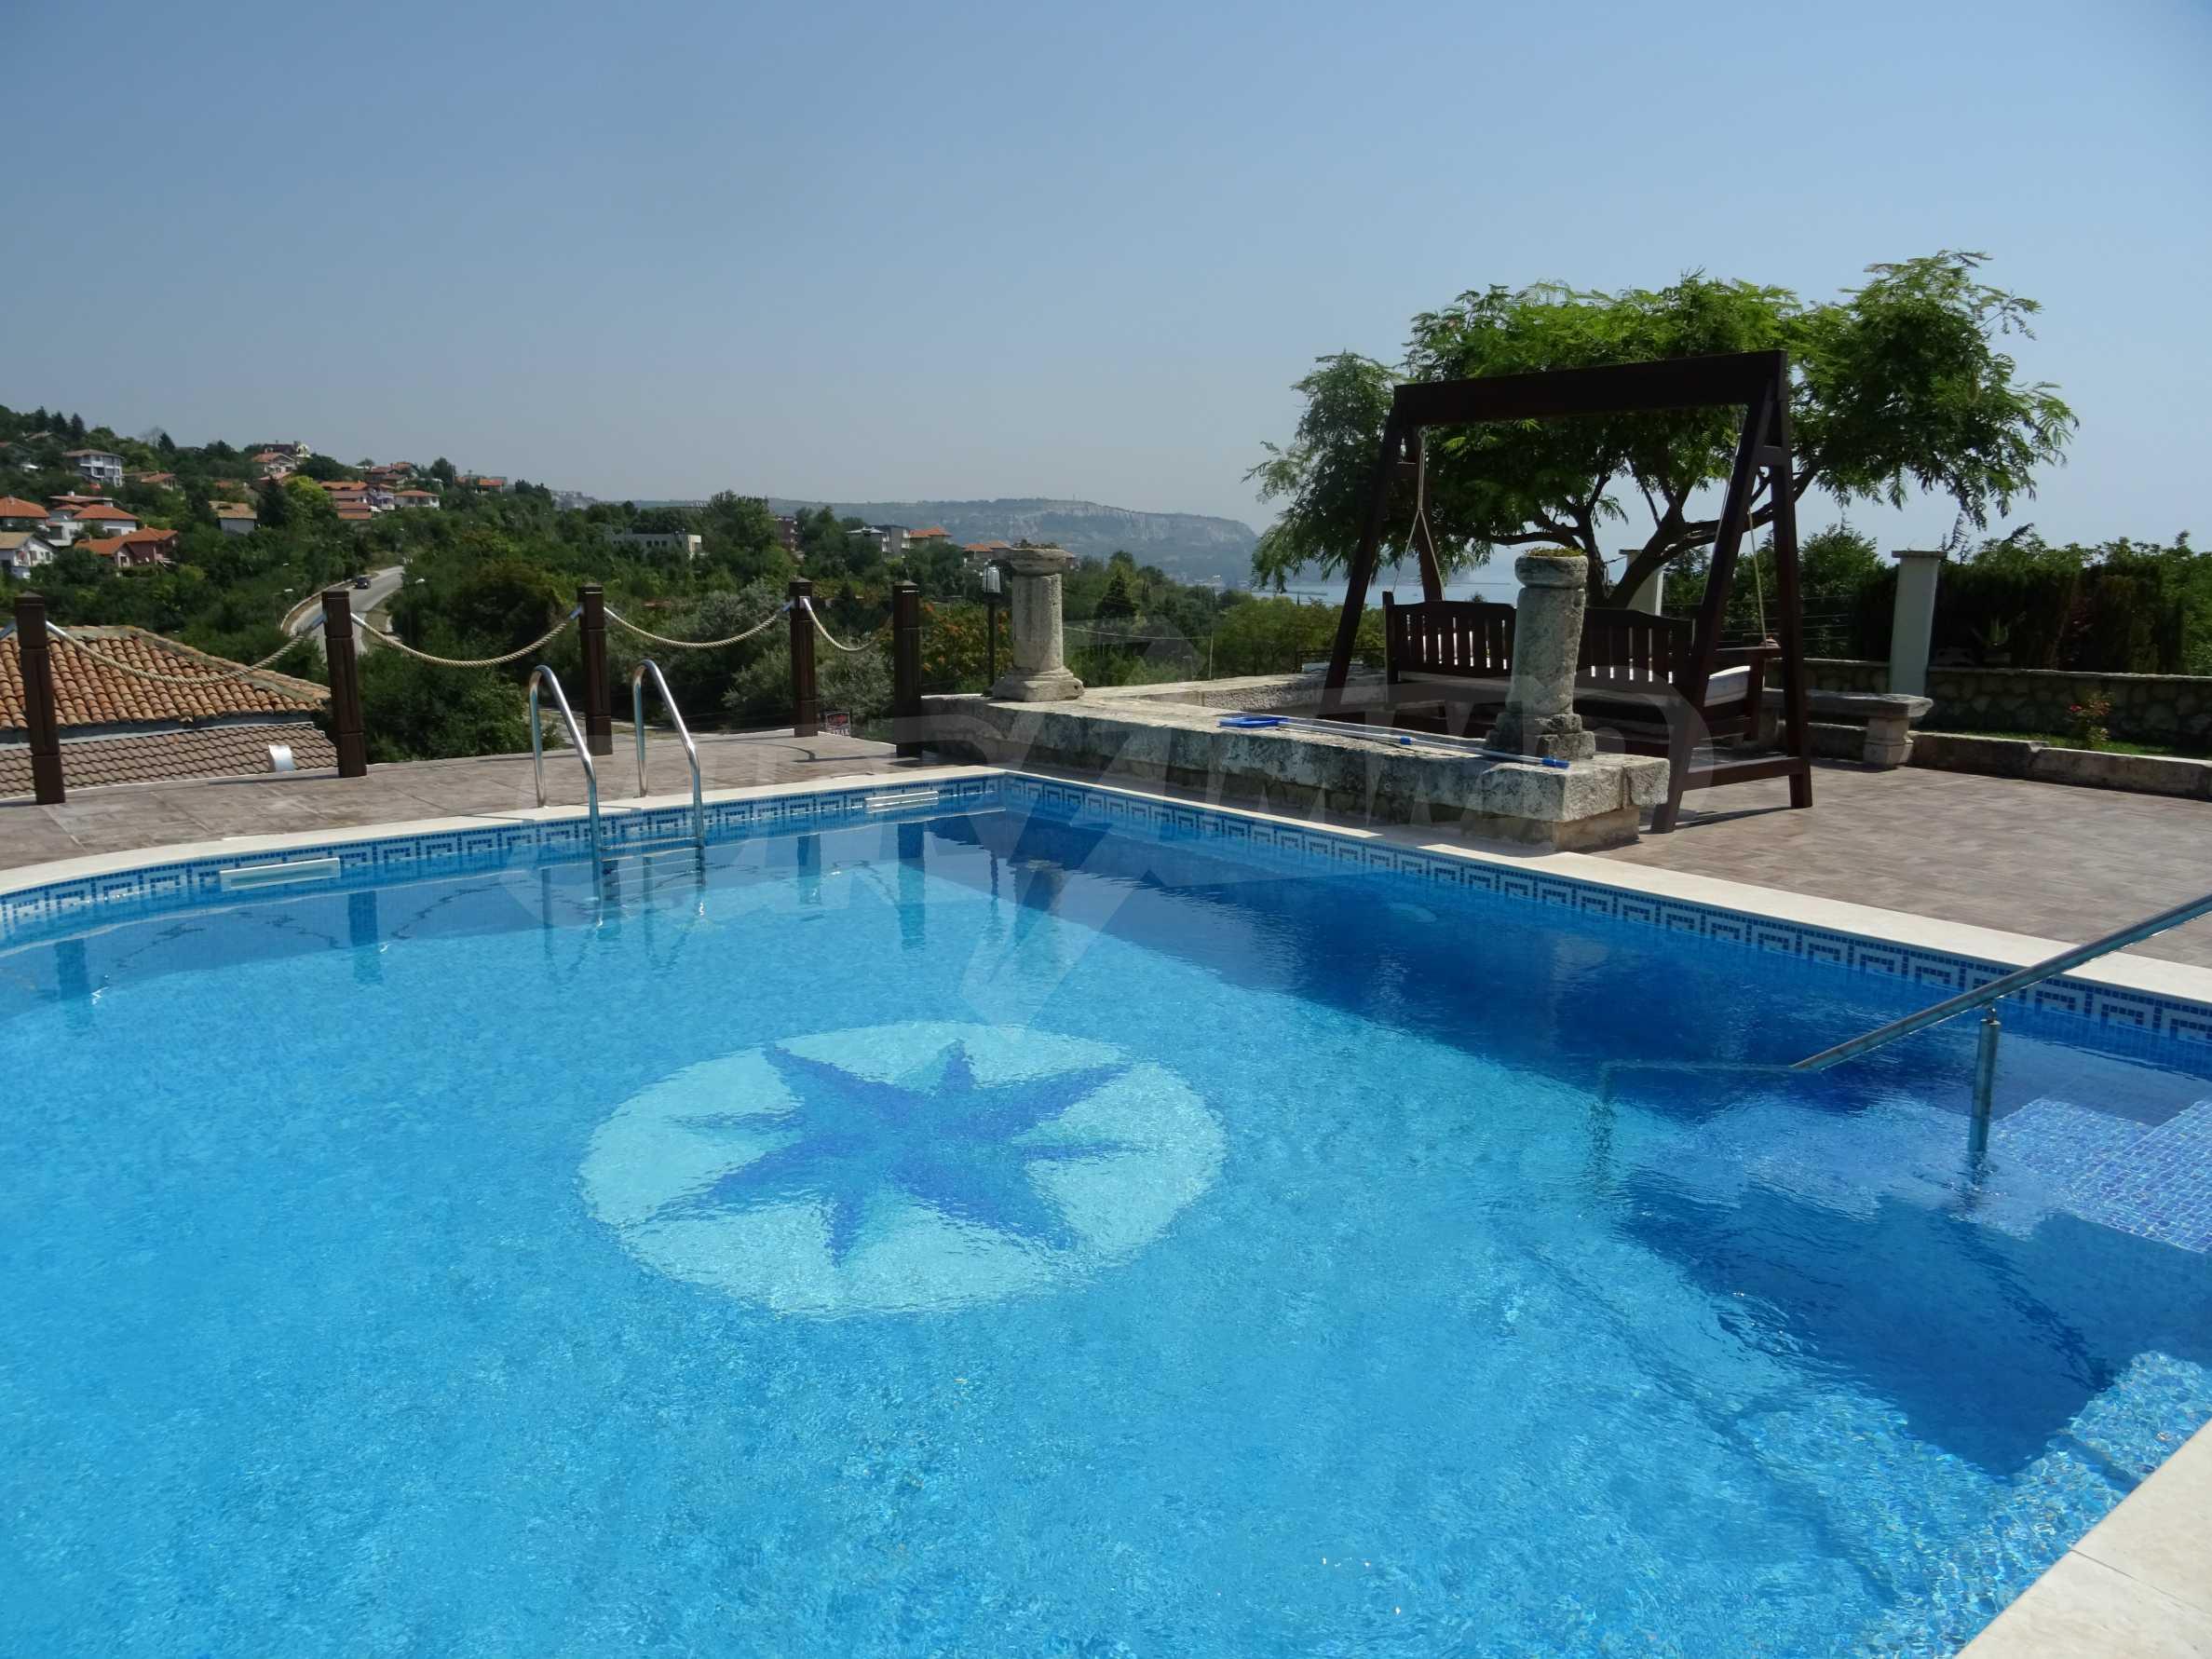 The Mediterranean style - a sense of luxury 10